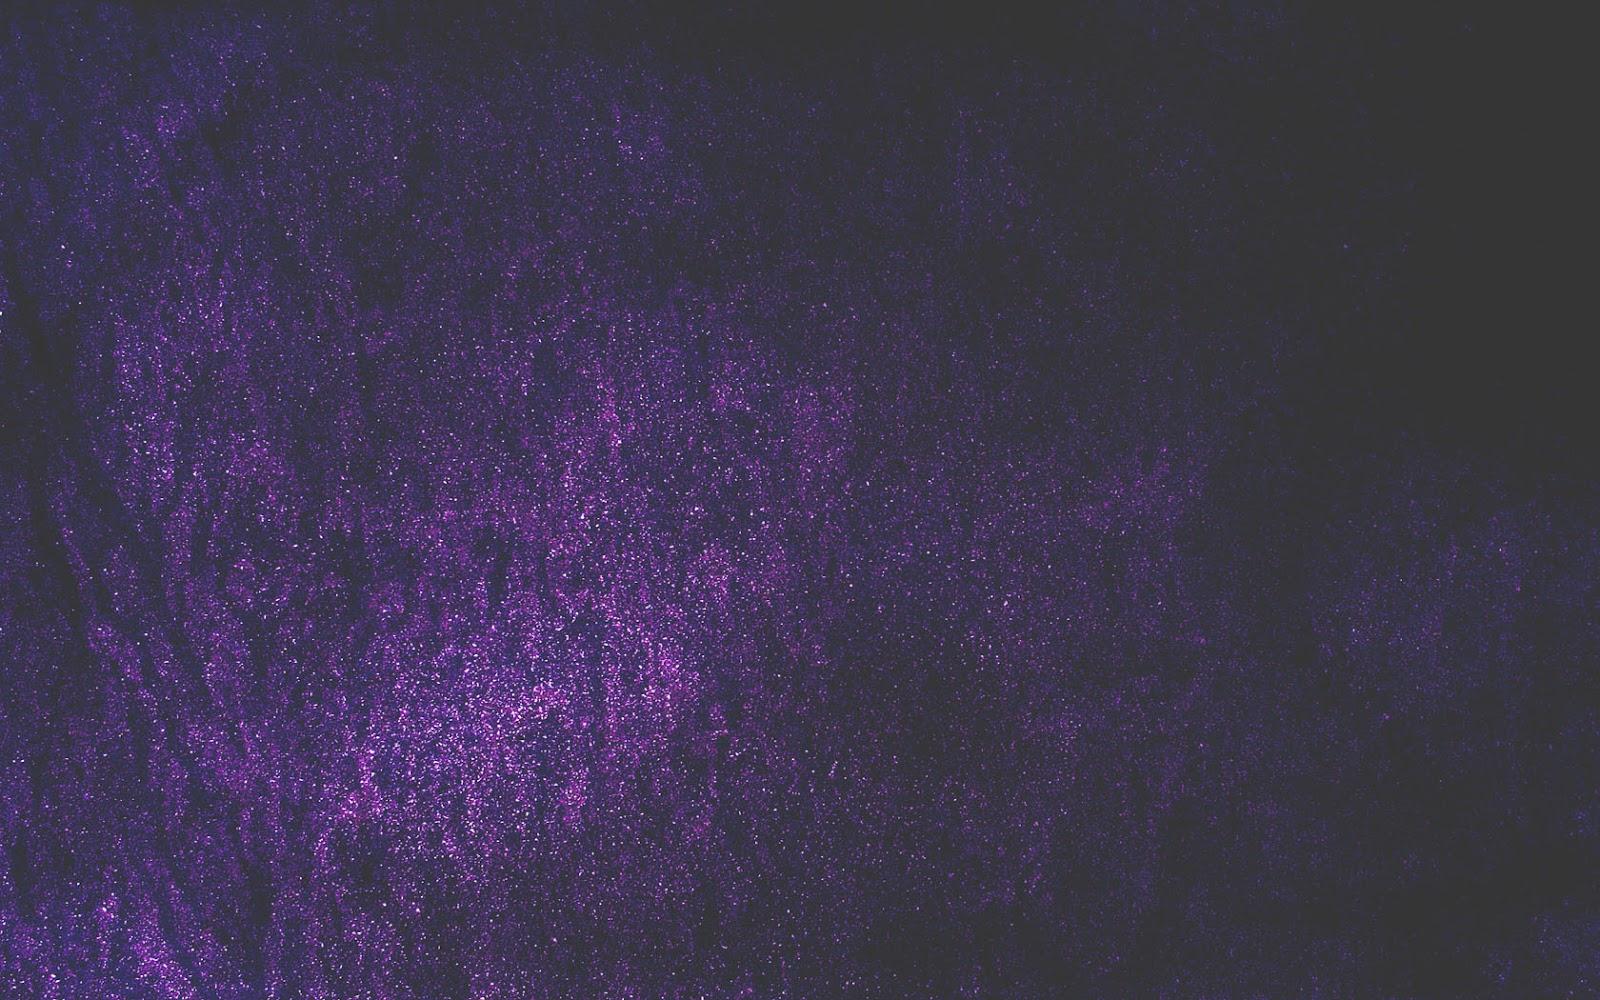 tumblr static soft grunge background tumblr 604jpg 1600x1000